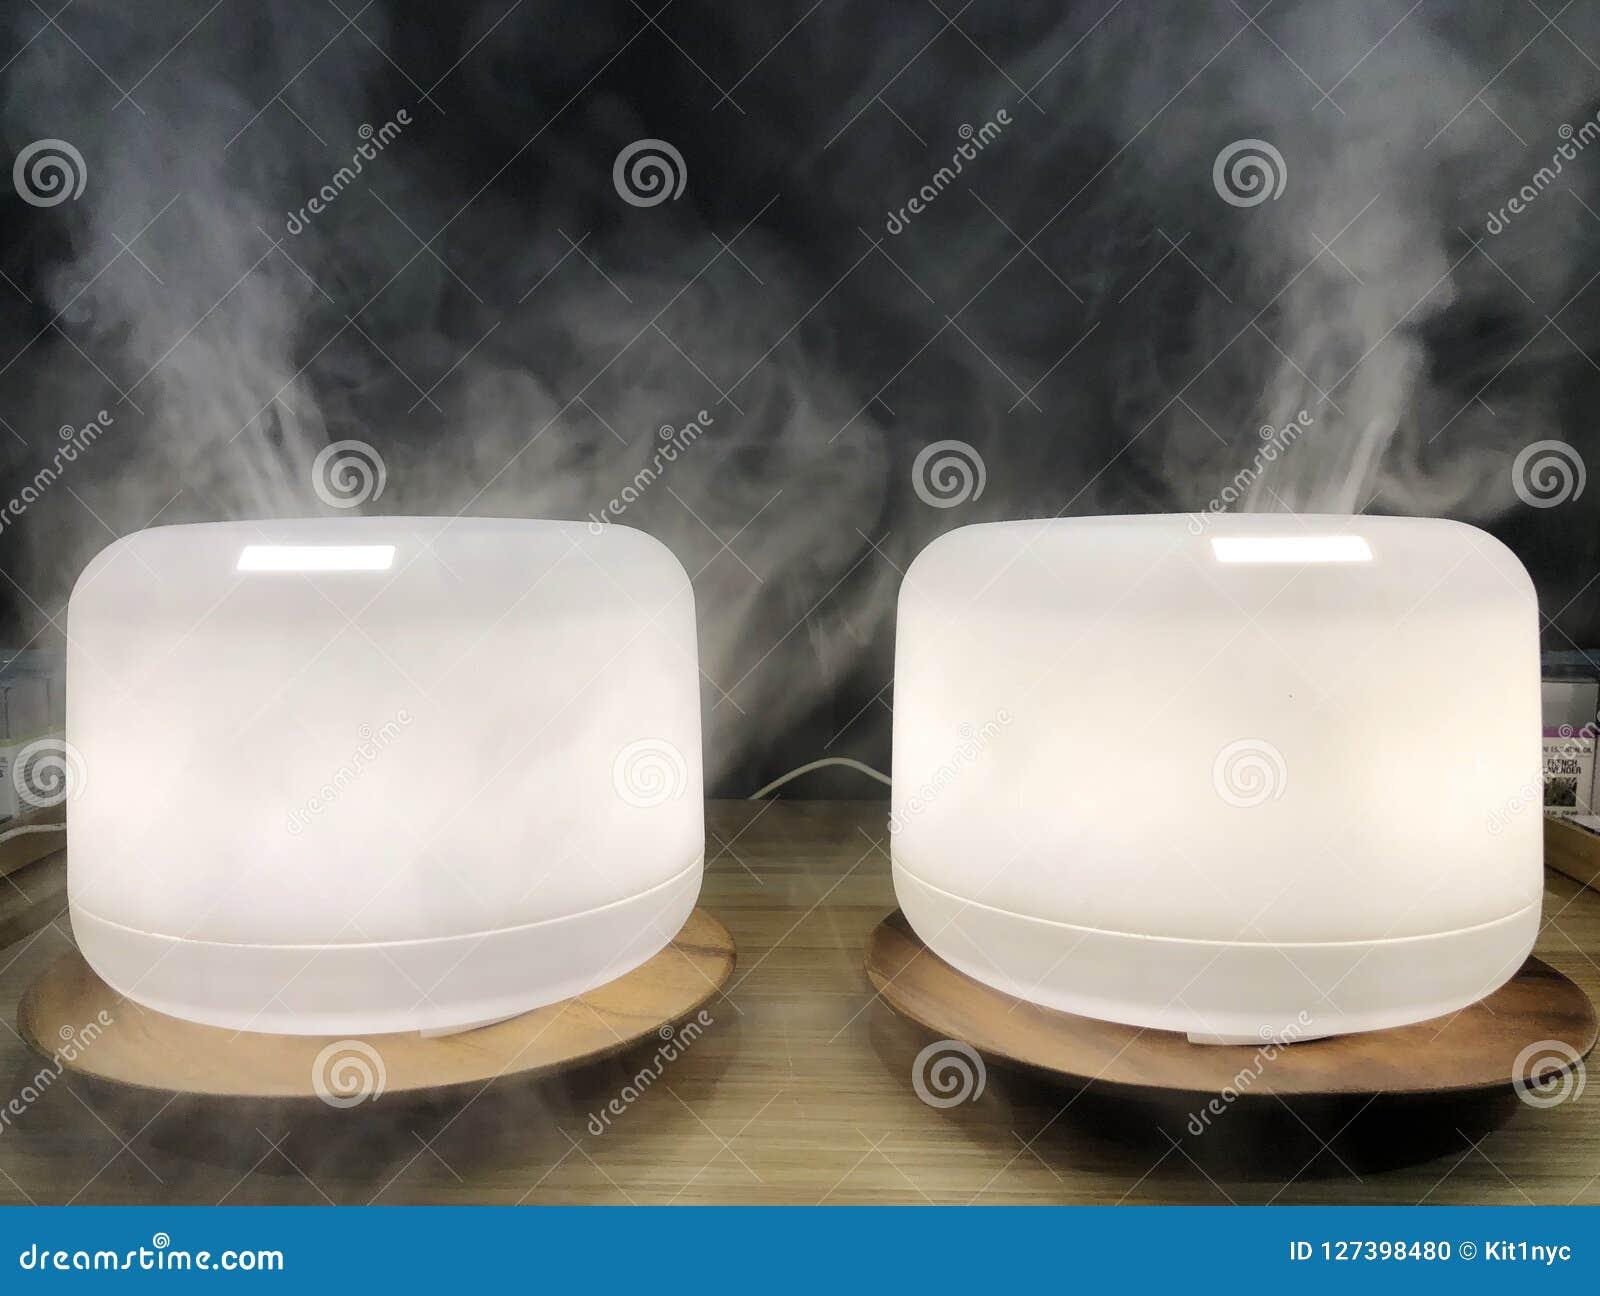 Benefícios de saúde frescos do purificador do ar da casa do atomizador da névoa do humidificador branco